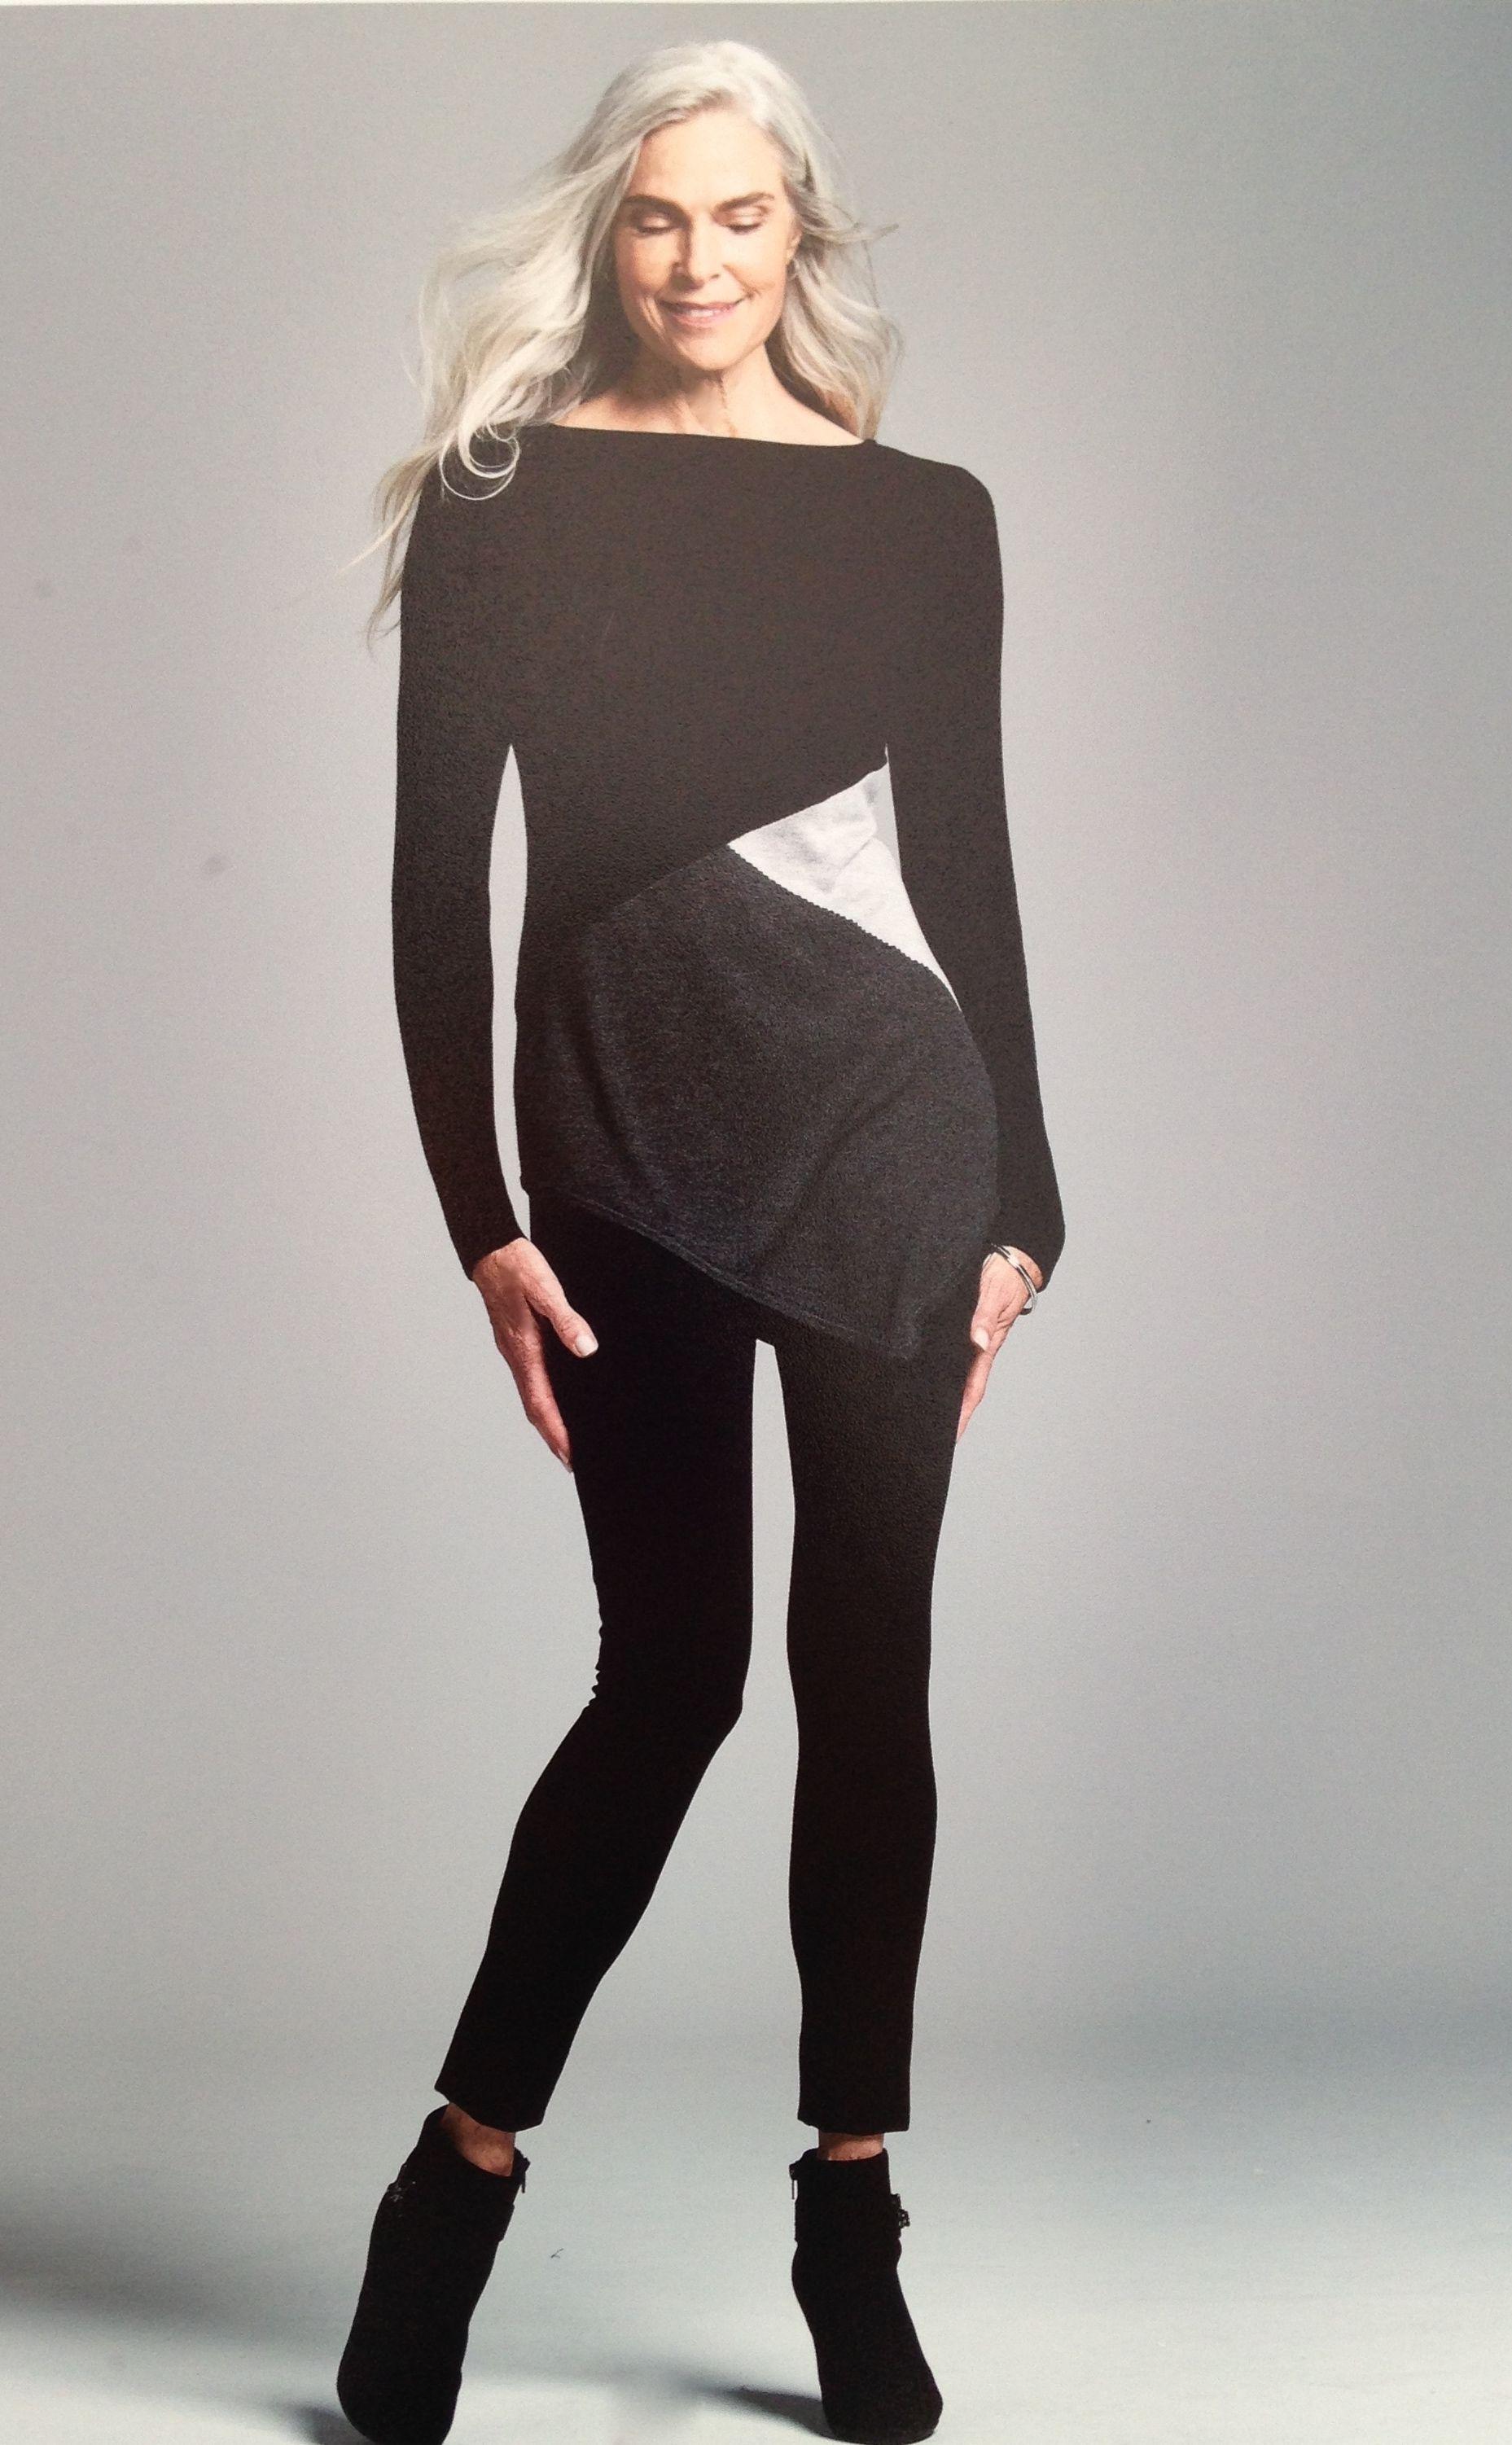 Tunic leggings comfortable clothing long gray hair Roxanne Gould ...